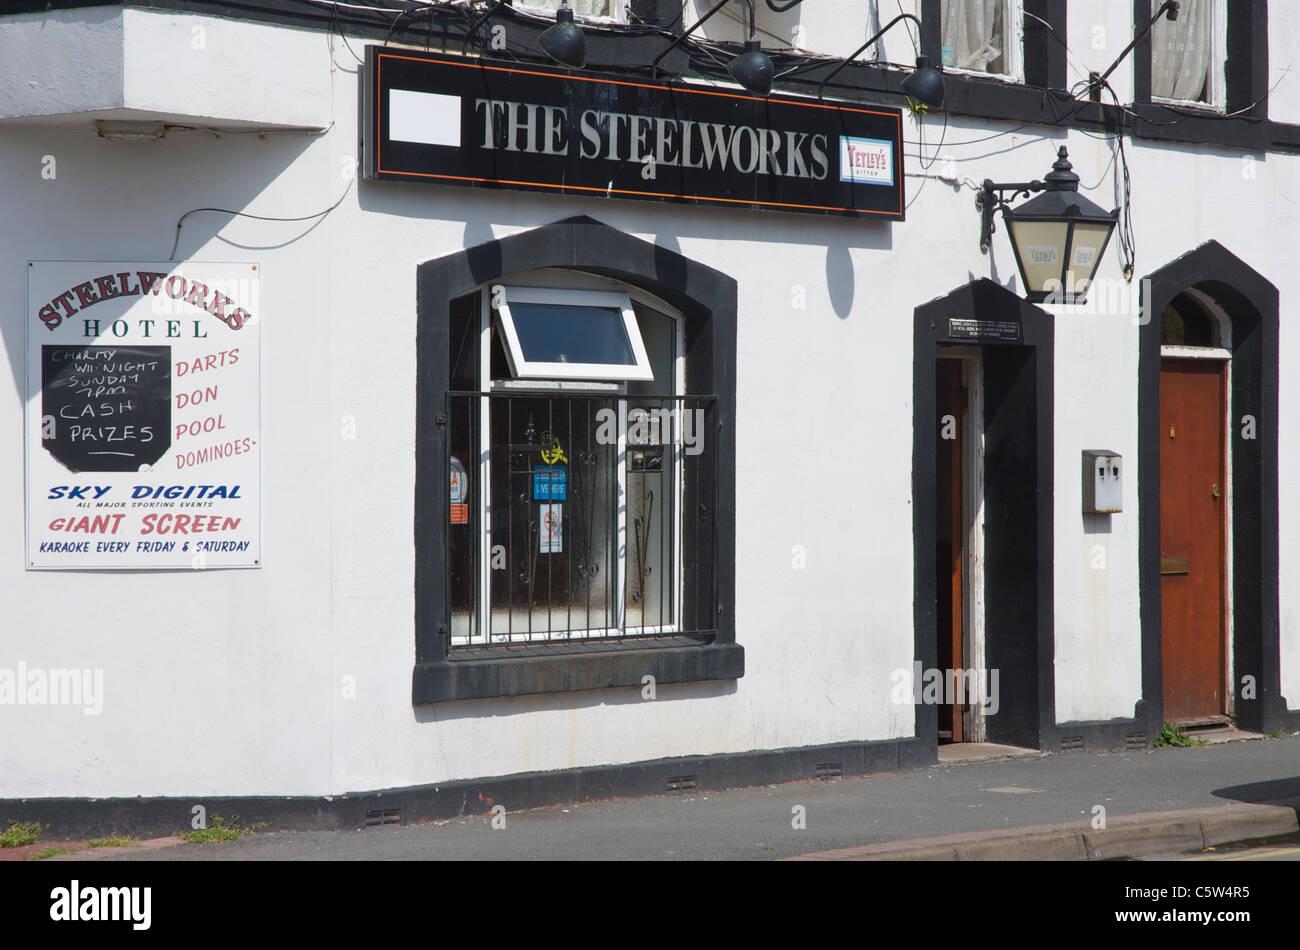 The Steelworks pub, Barrow-in-Furness, Cumbria, England UK - Stock Image